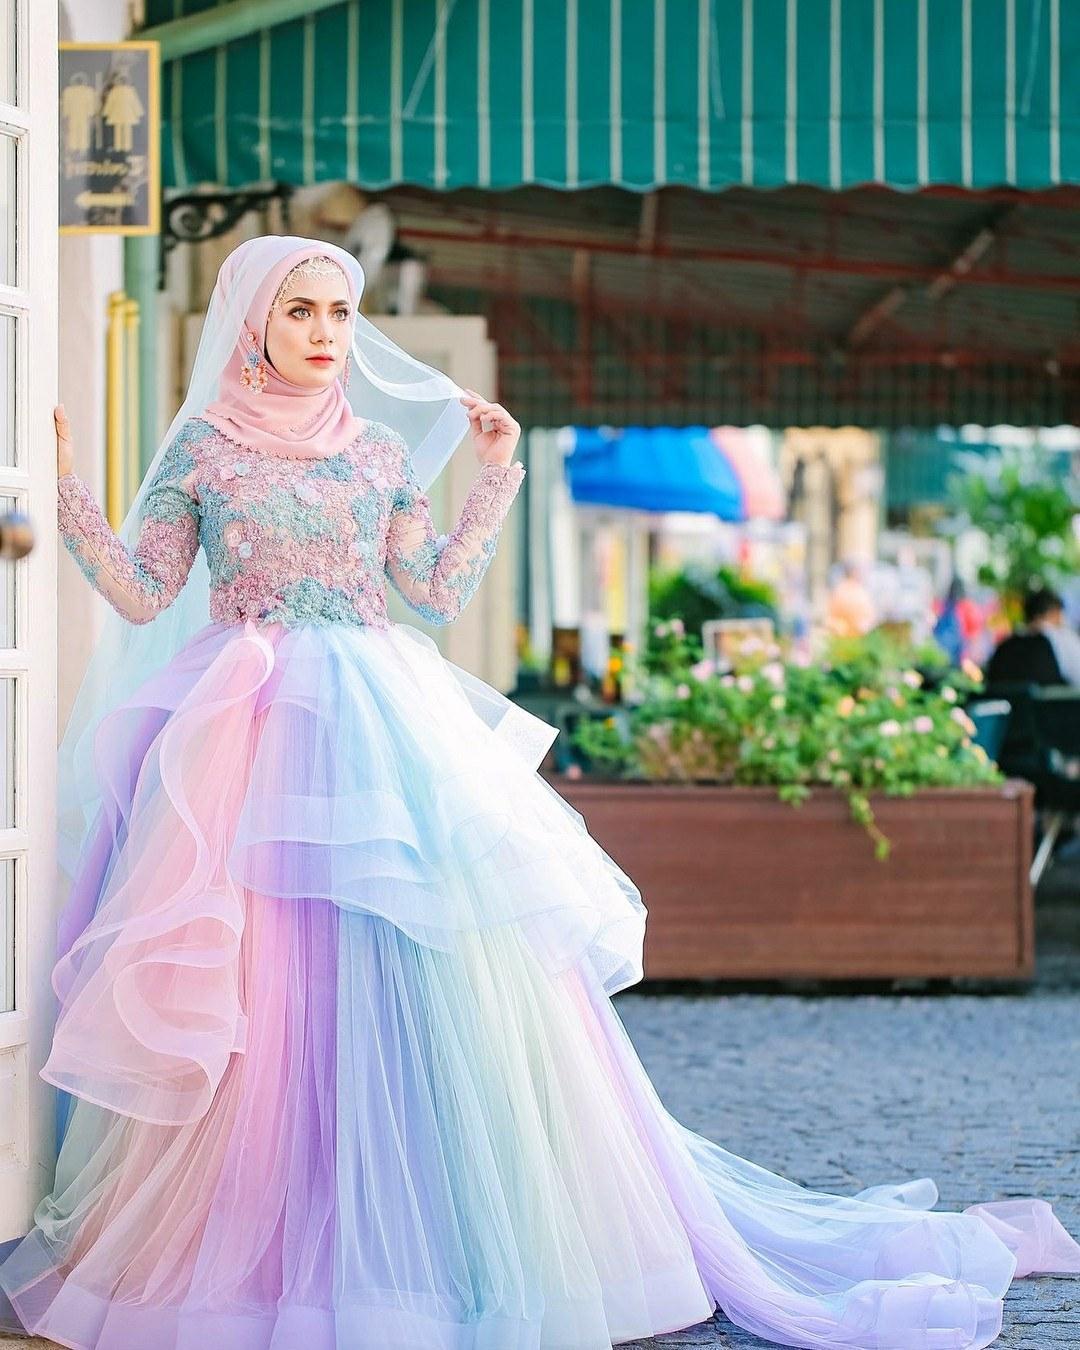 Ide Baju Pengantin Muslimah Malaysia Etdg 34 Inspirasi Terpopuler Gaun Pengantin Malaysia